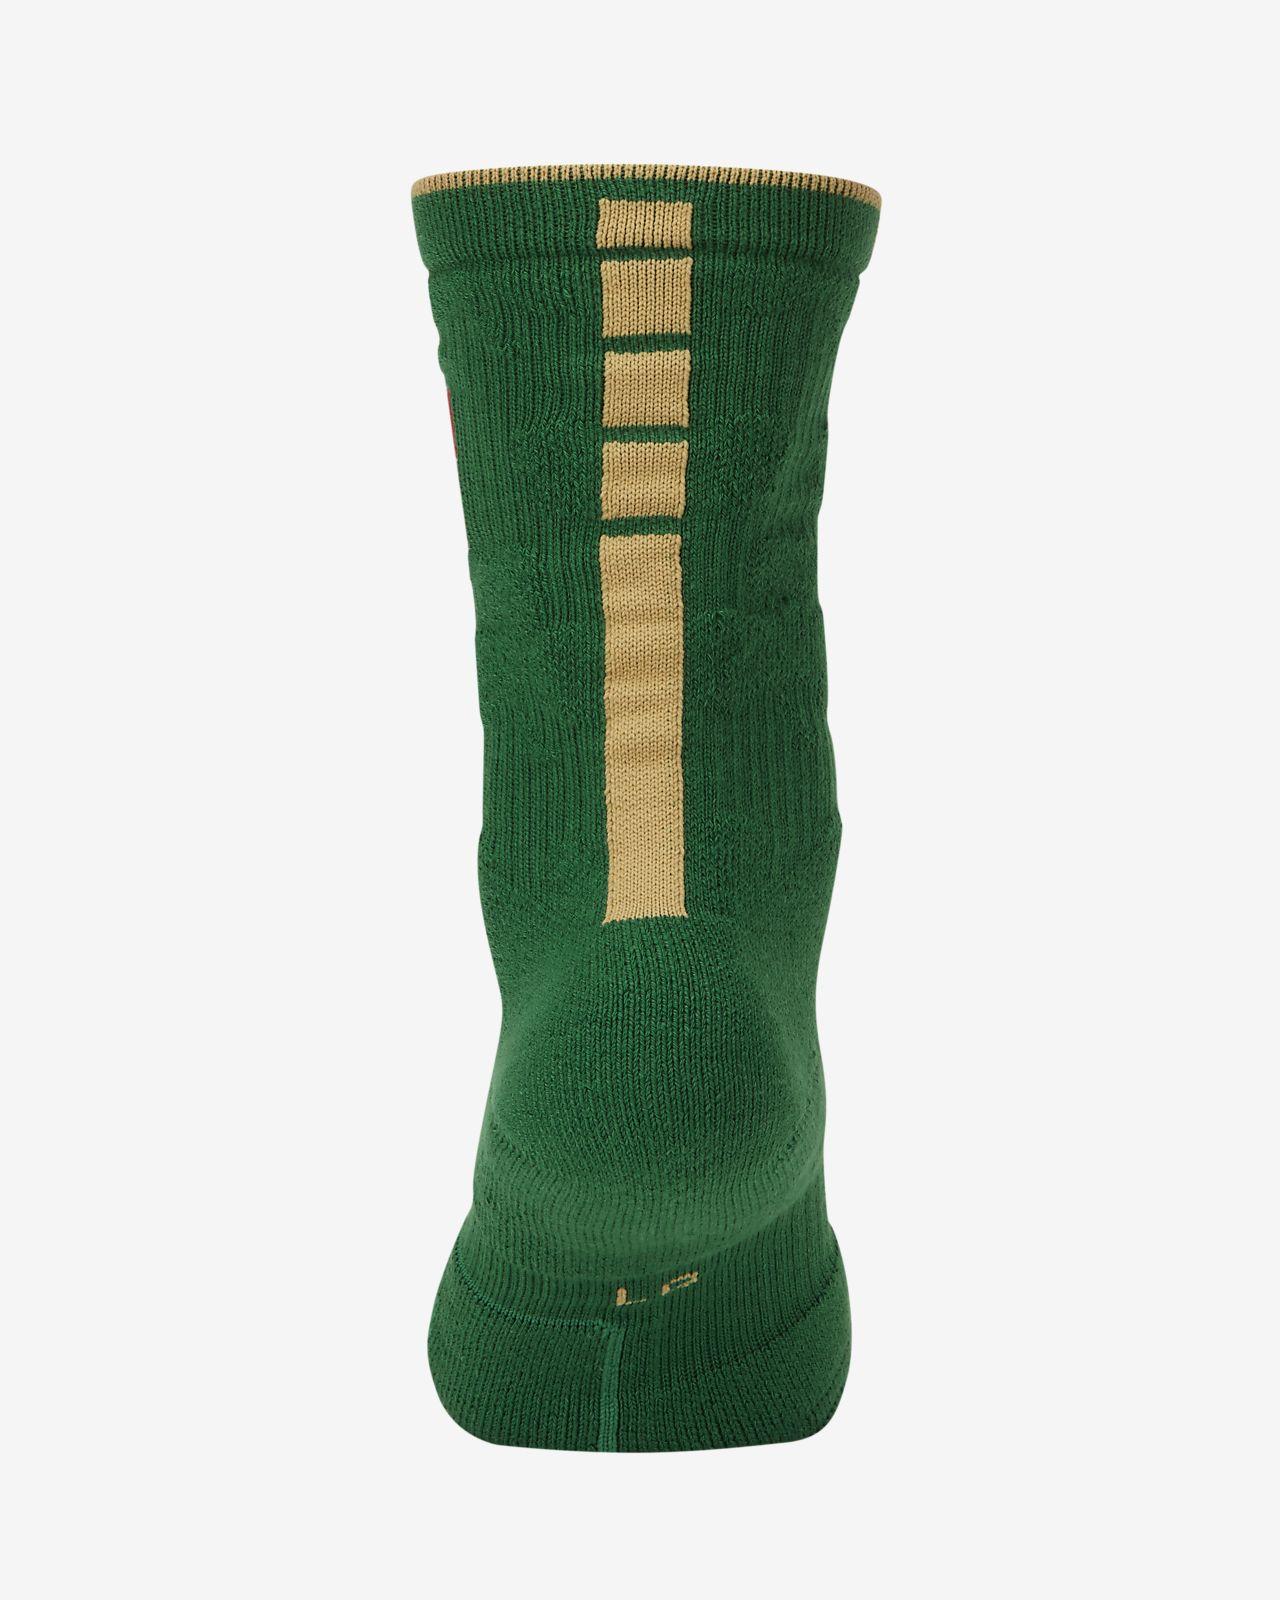 Boston Celtics City Edition Nike Elite NBA Crew Socks